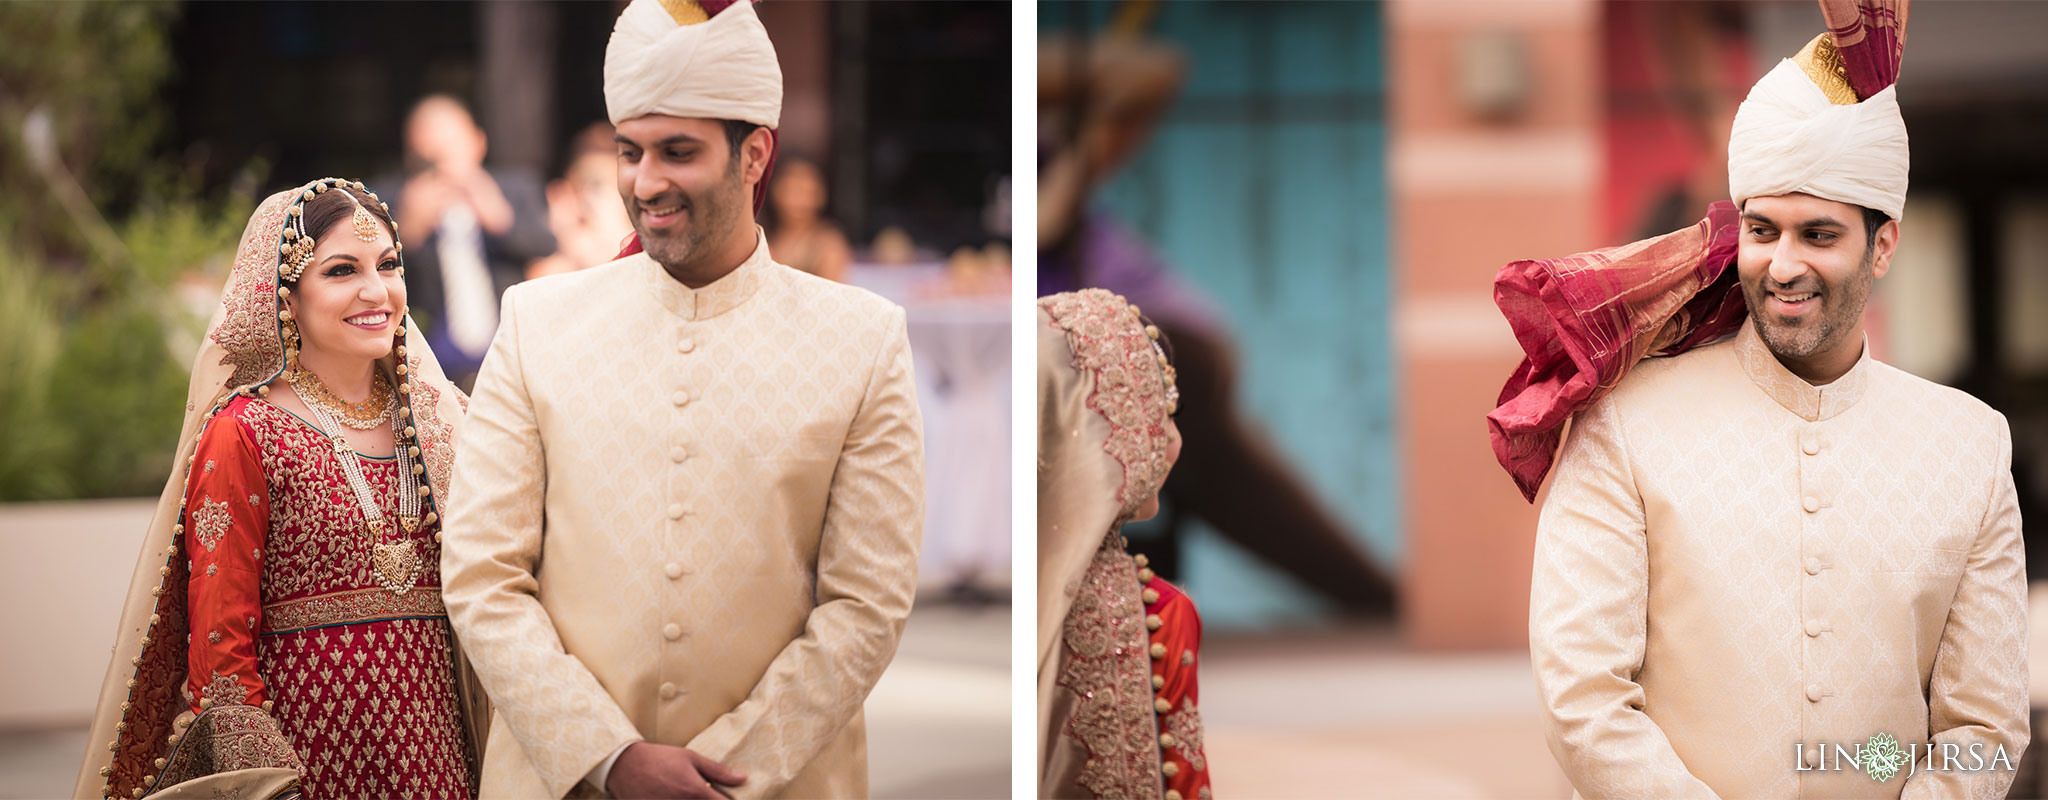 08 hilton long beach pakistani persian muslim first look wedding photography